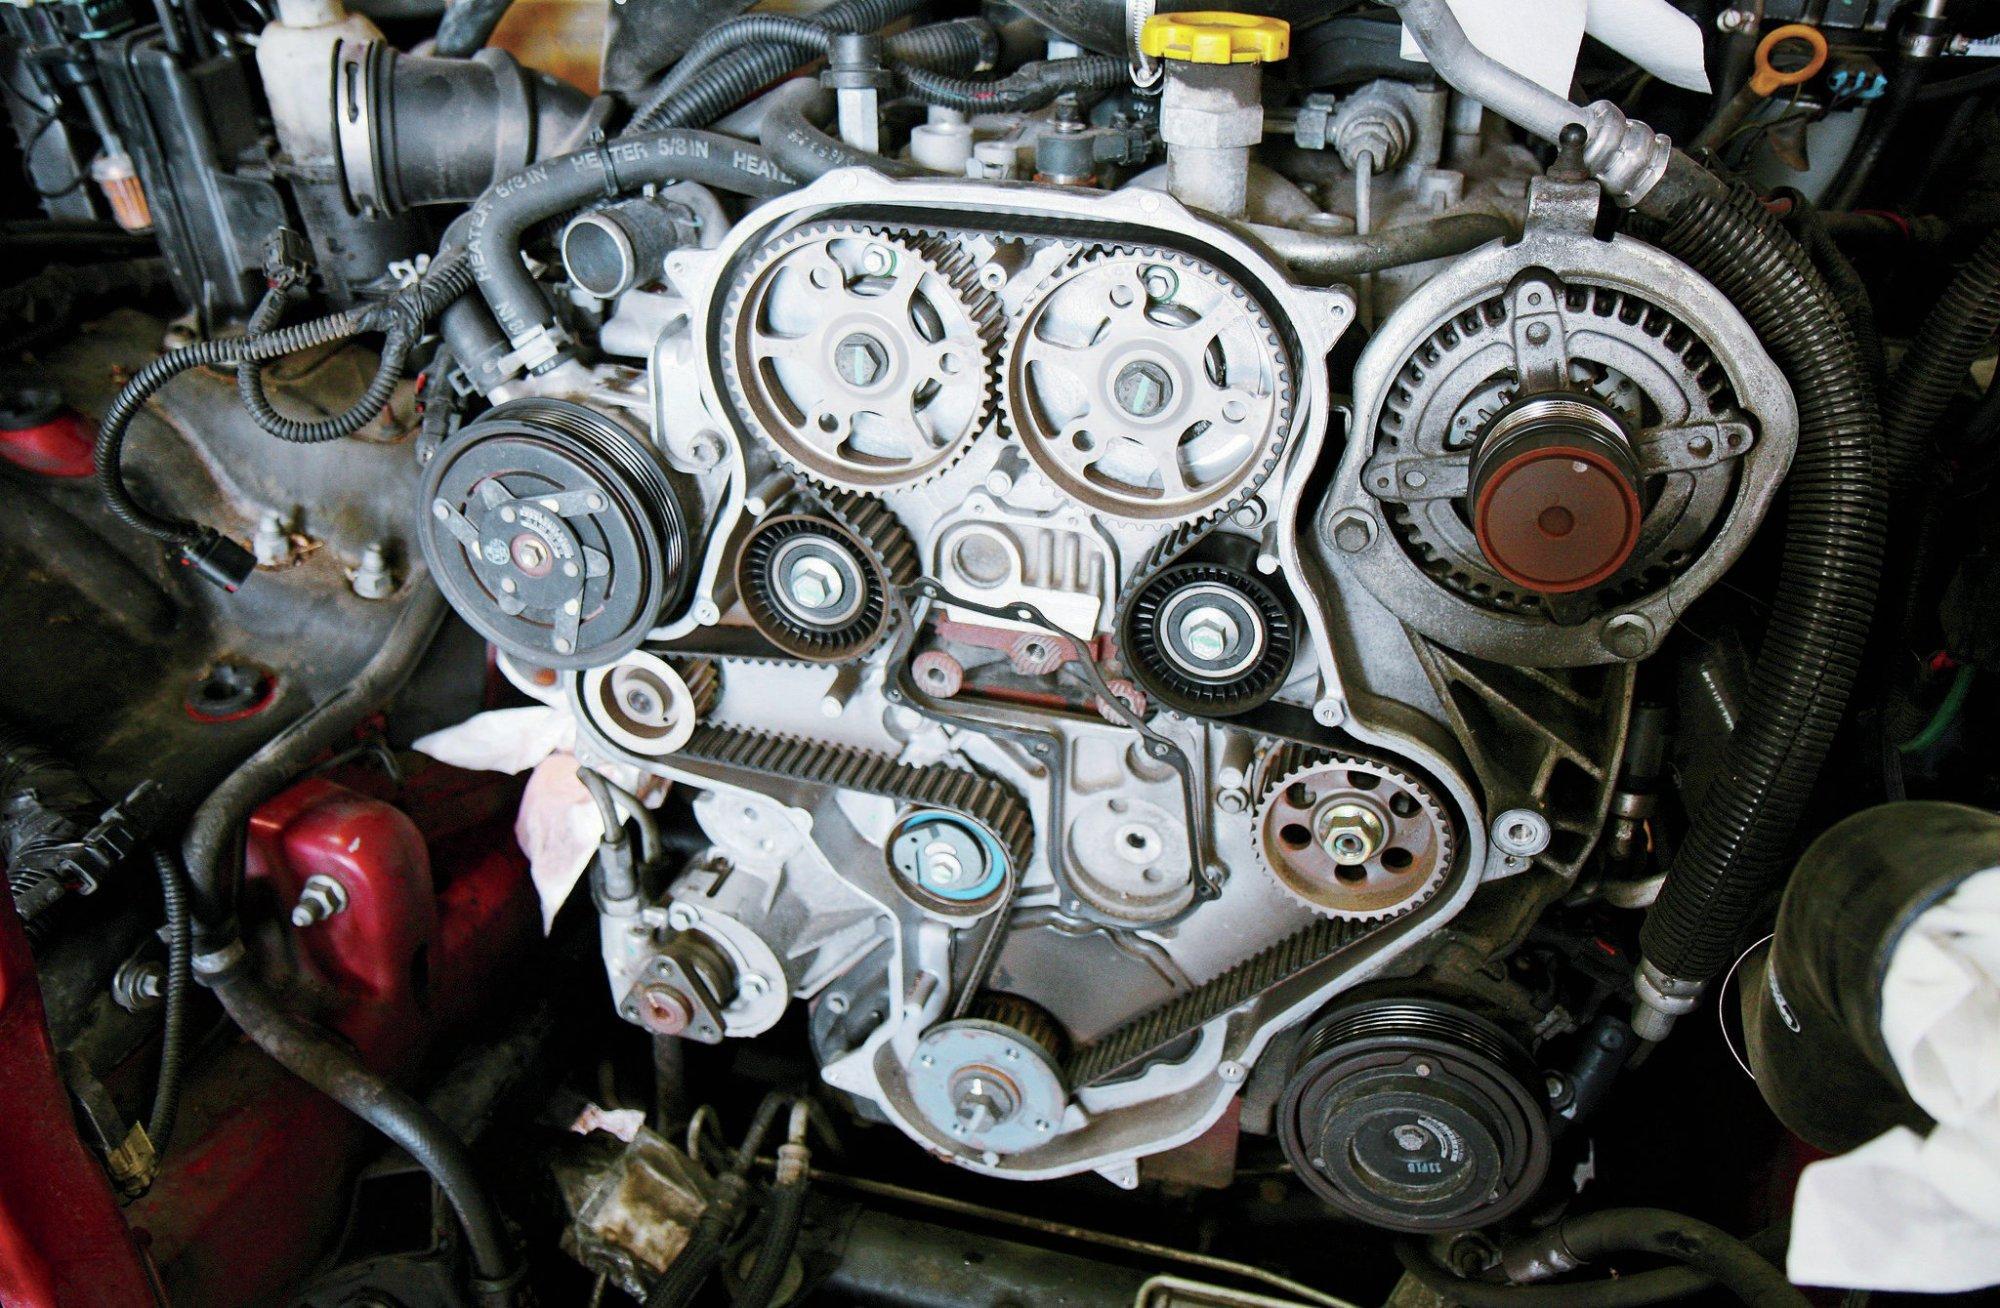 hight resolution of 2007 dodge nitro engine diagram wiring library rh 41 codingcommunity de dodge nitro cylinder diagram 2007